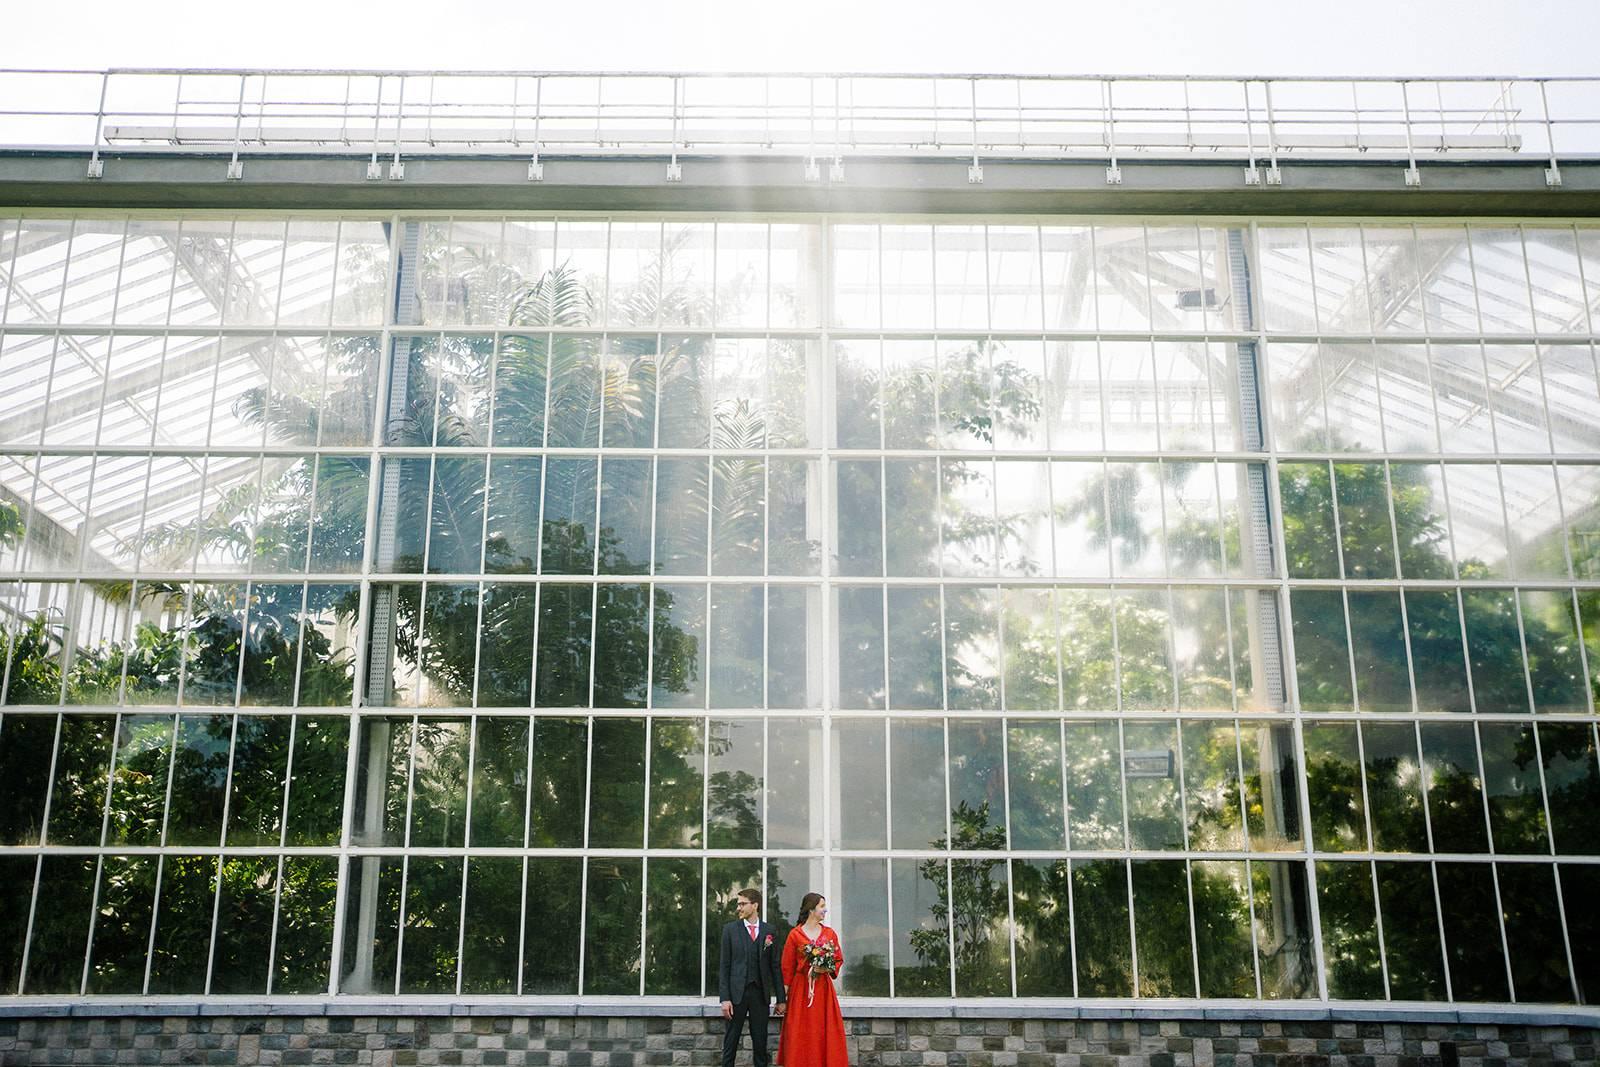 Hilde Eyckmans - CharlotteToon35mm - Hilde Eyckmans-71kopie - House of Weddings